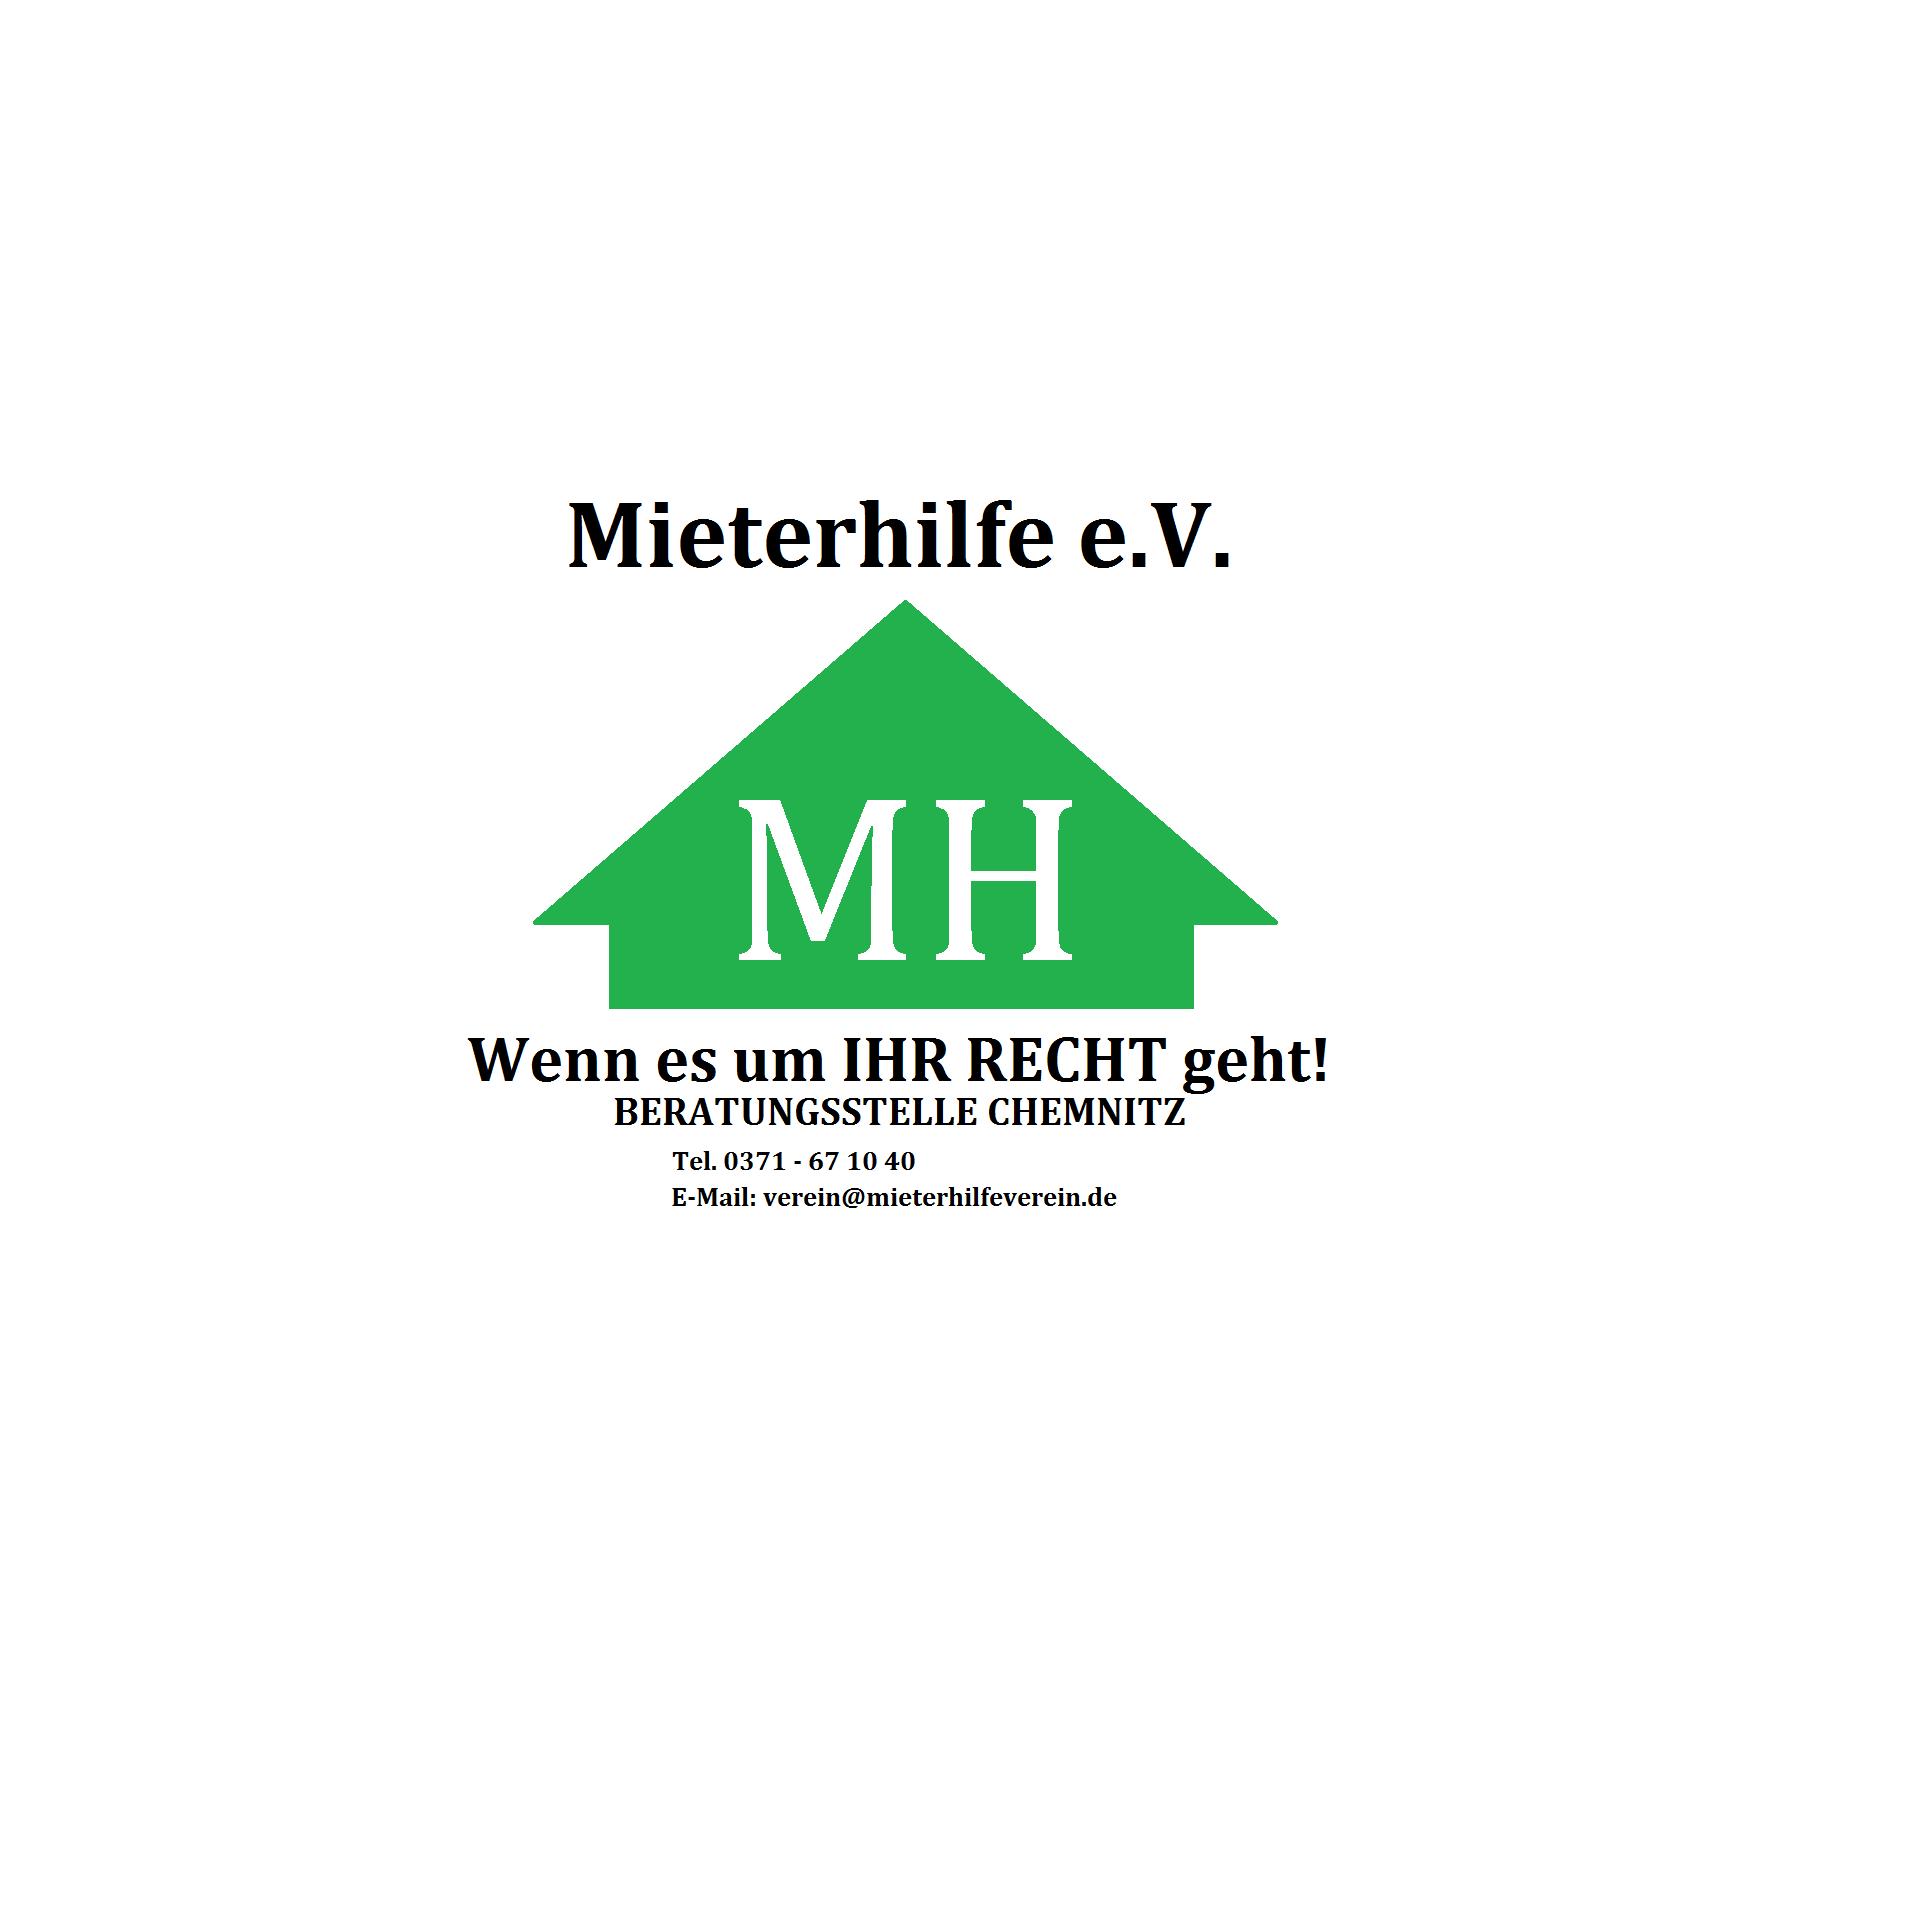 Mieterhilfe e v f r n rnberg und umgebung chemnitz - Mobelhauser nurnberg und umgebung ...